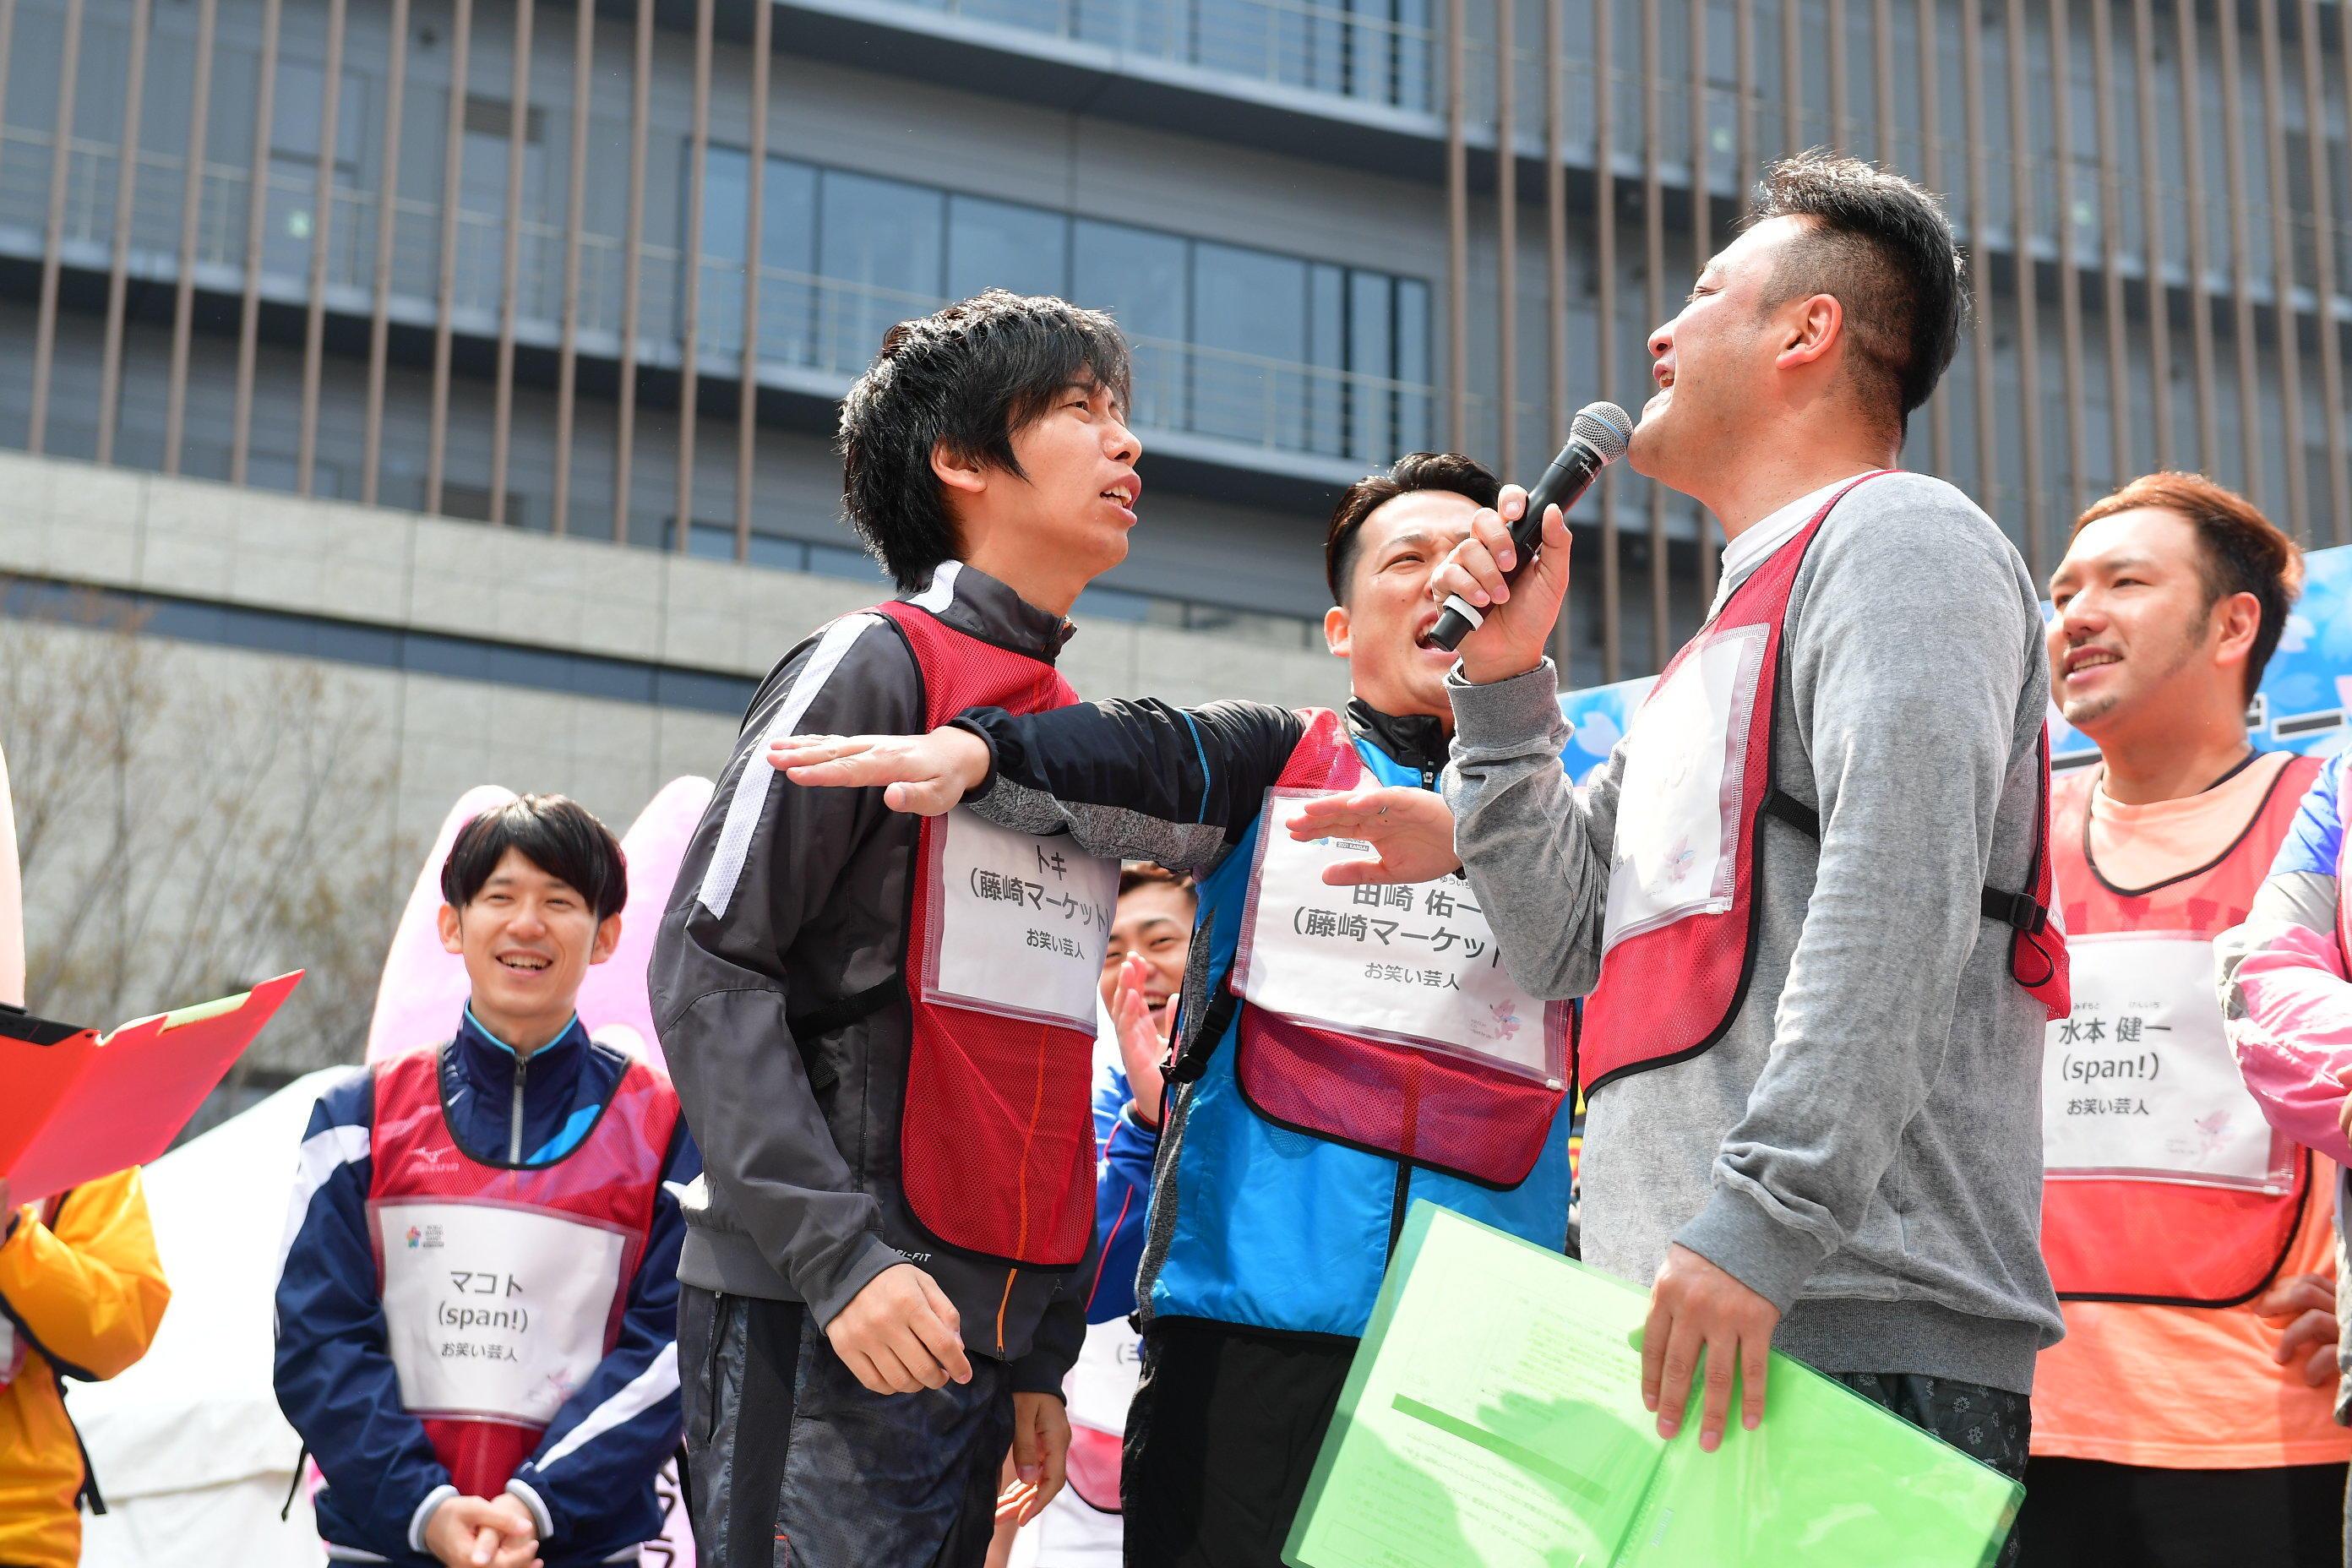 http://news.yoshimoto.co.jp/20180325175035-032260900de8ba67b85bf903f97f508a16334101.jpg